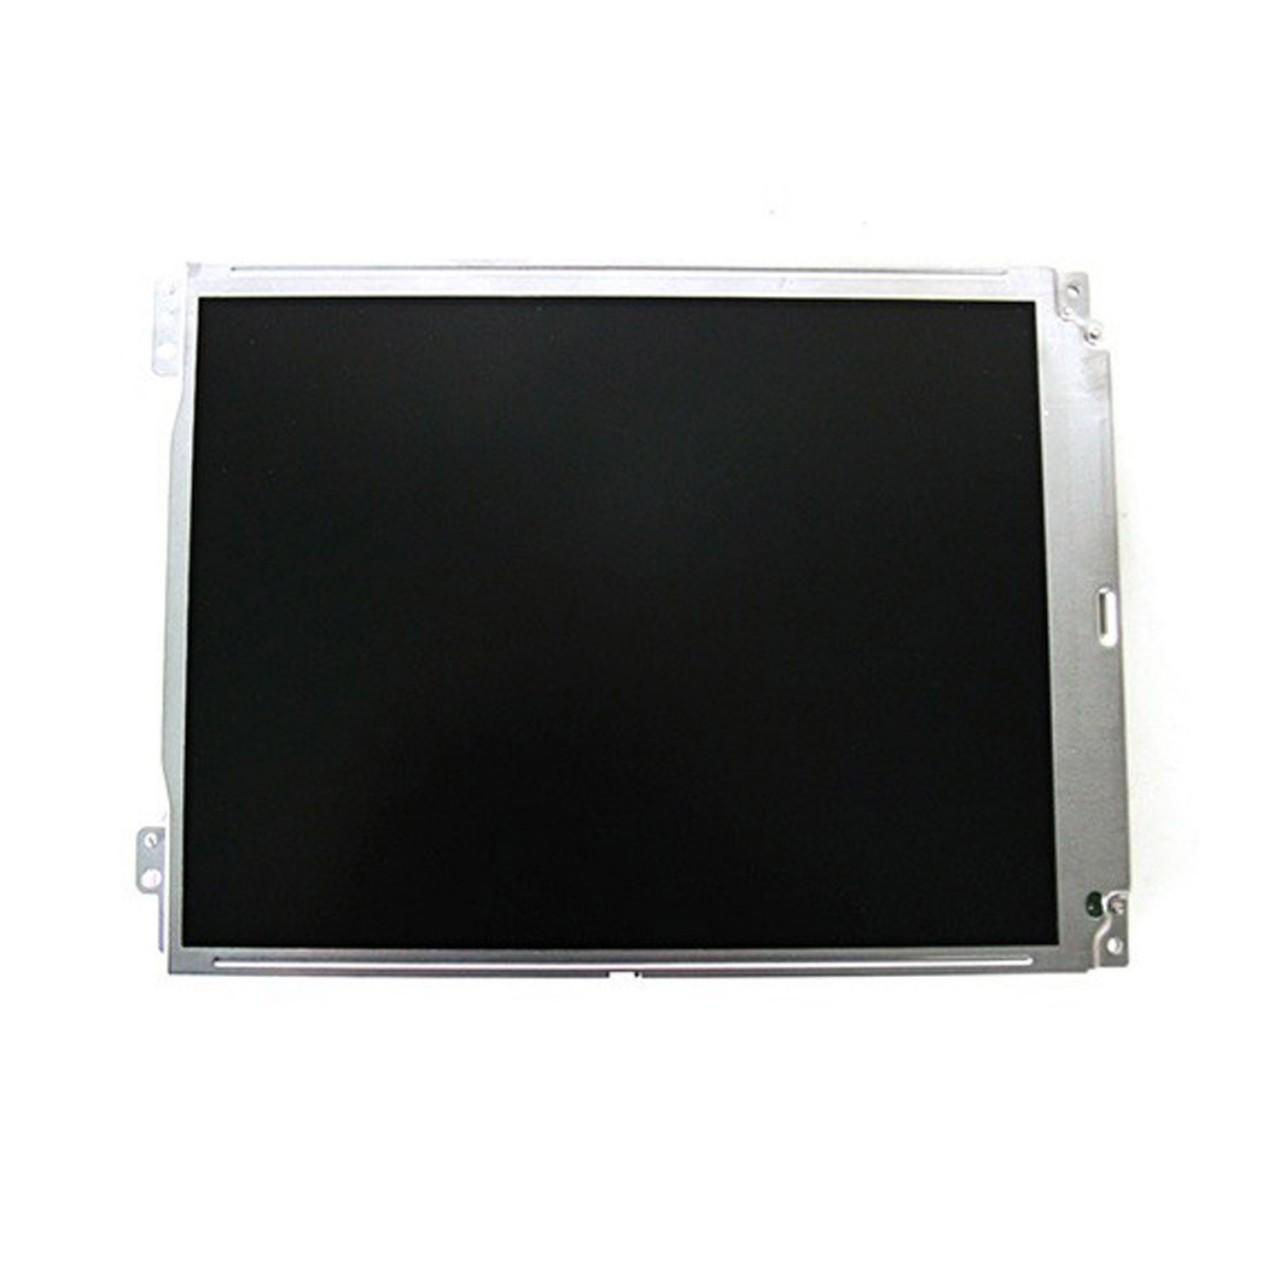 philips intellivue mp30 monitor manual